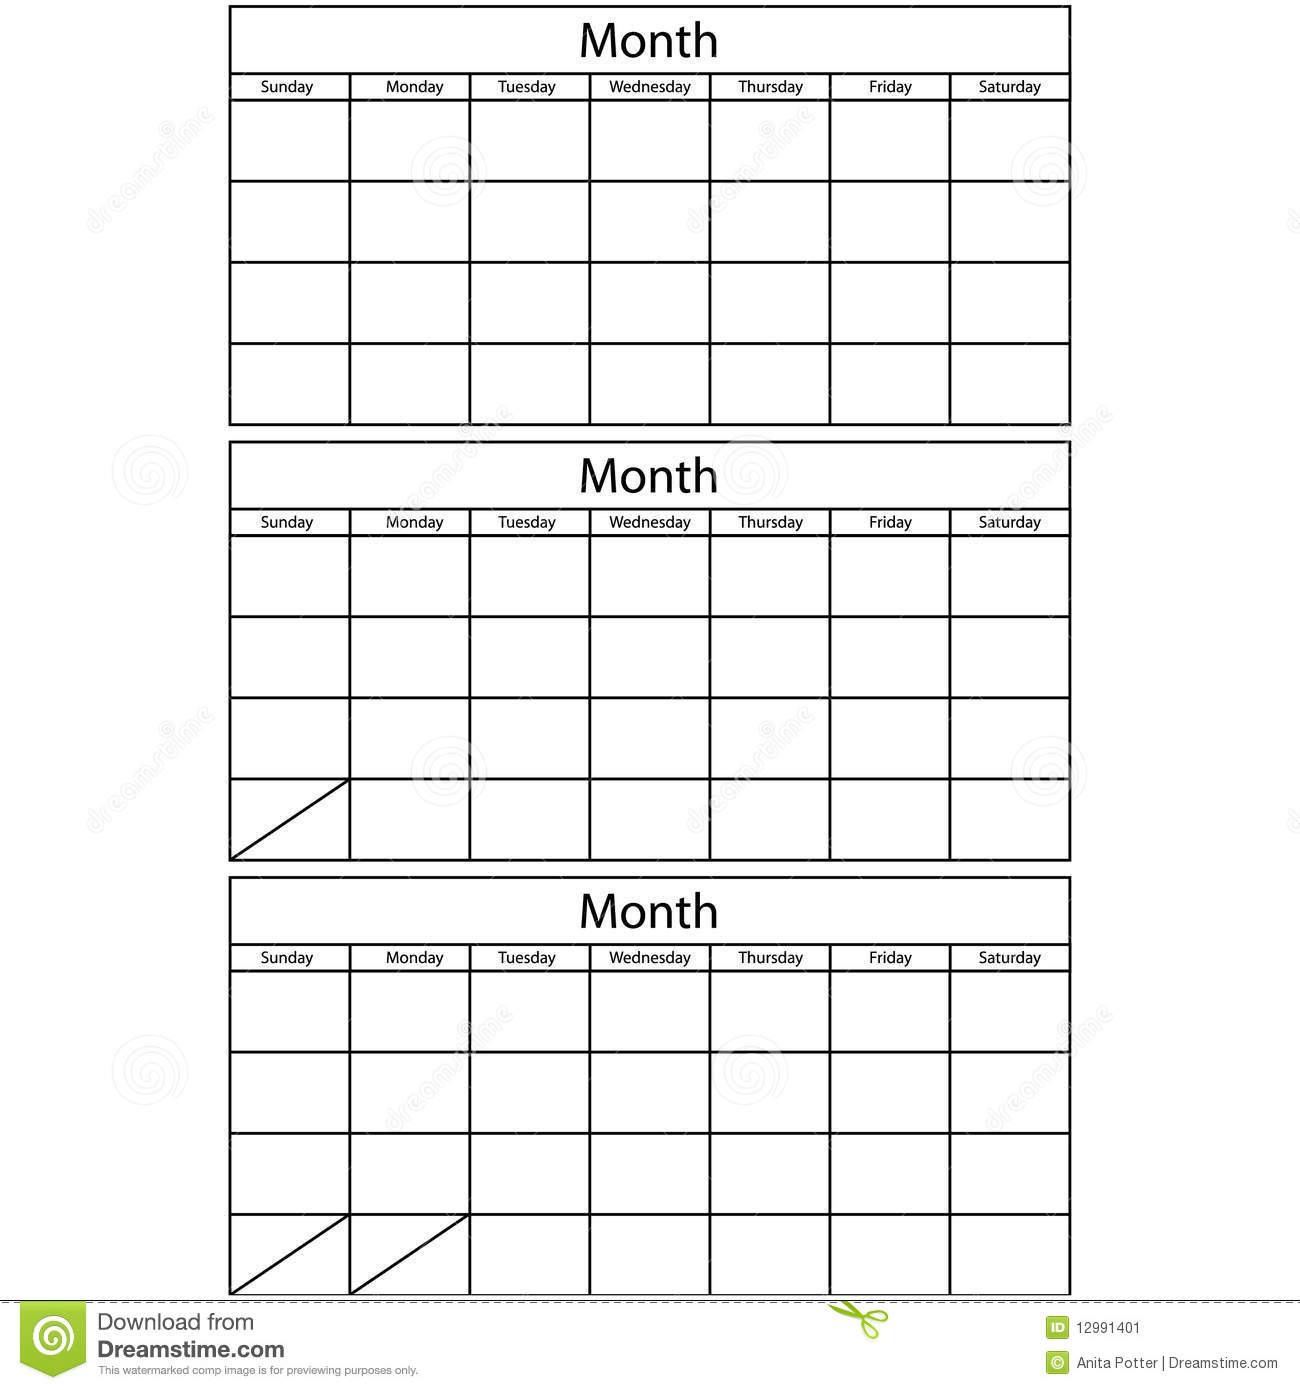 Blank 6 Week Calendar Template   Example Calendar Printable